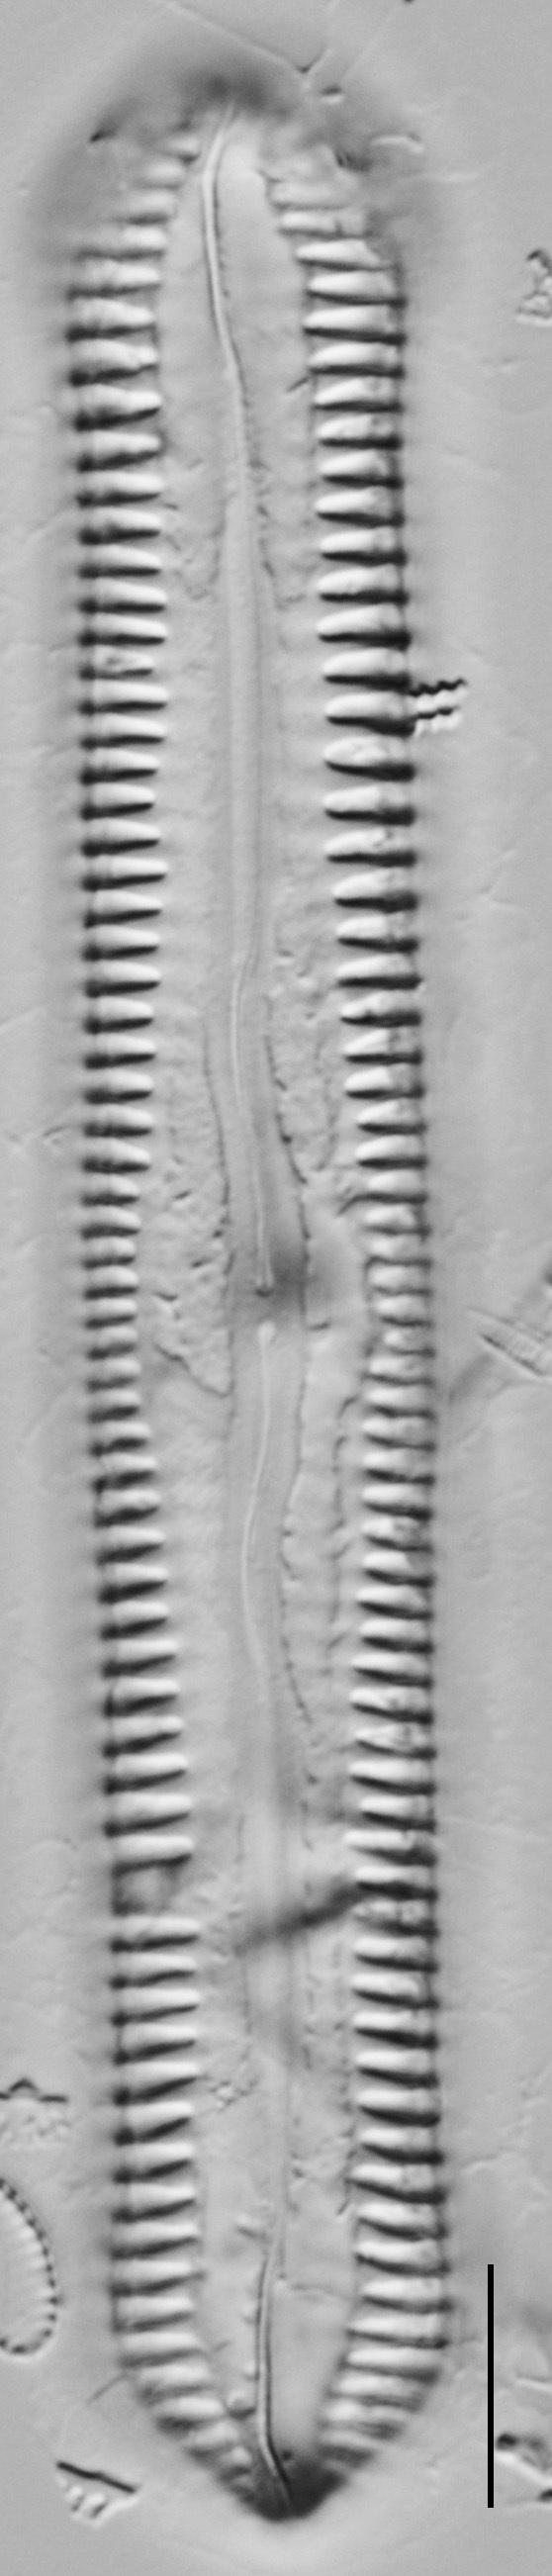 Pinnularia cuneicephala LM1